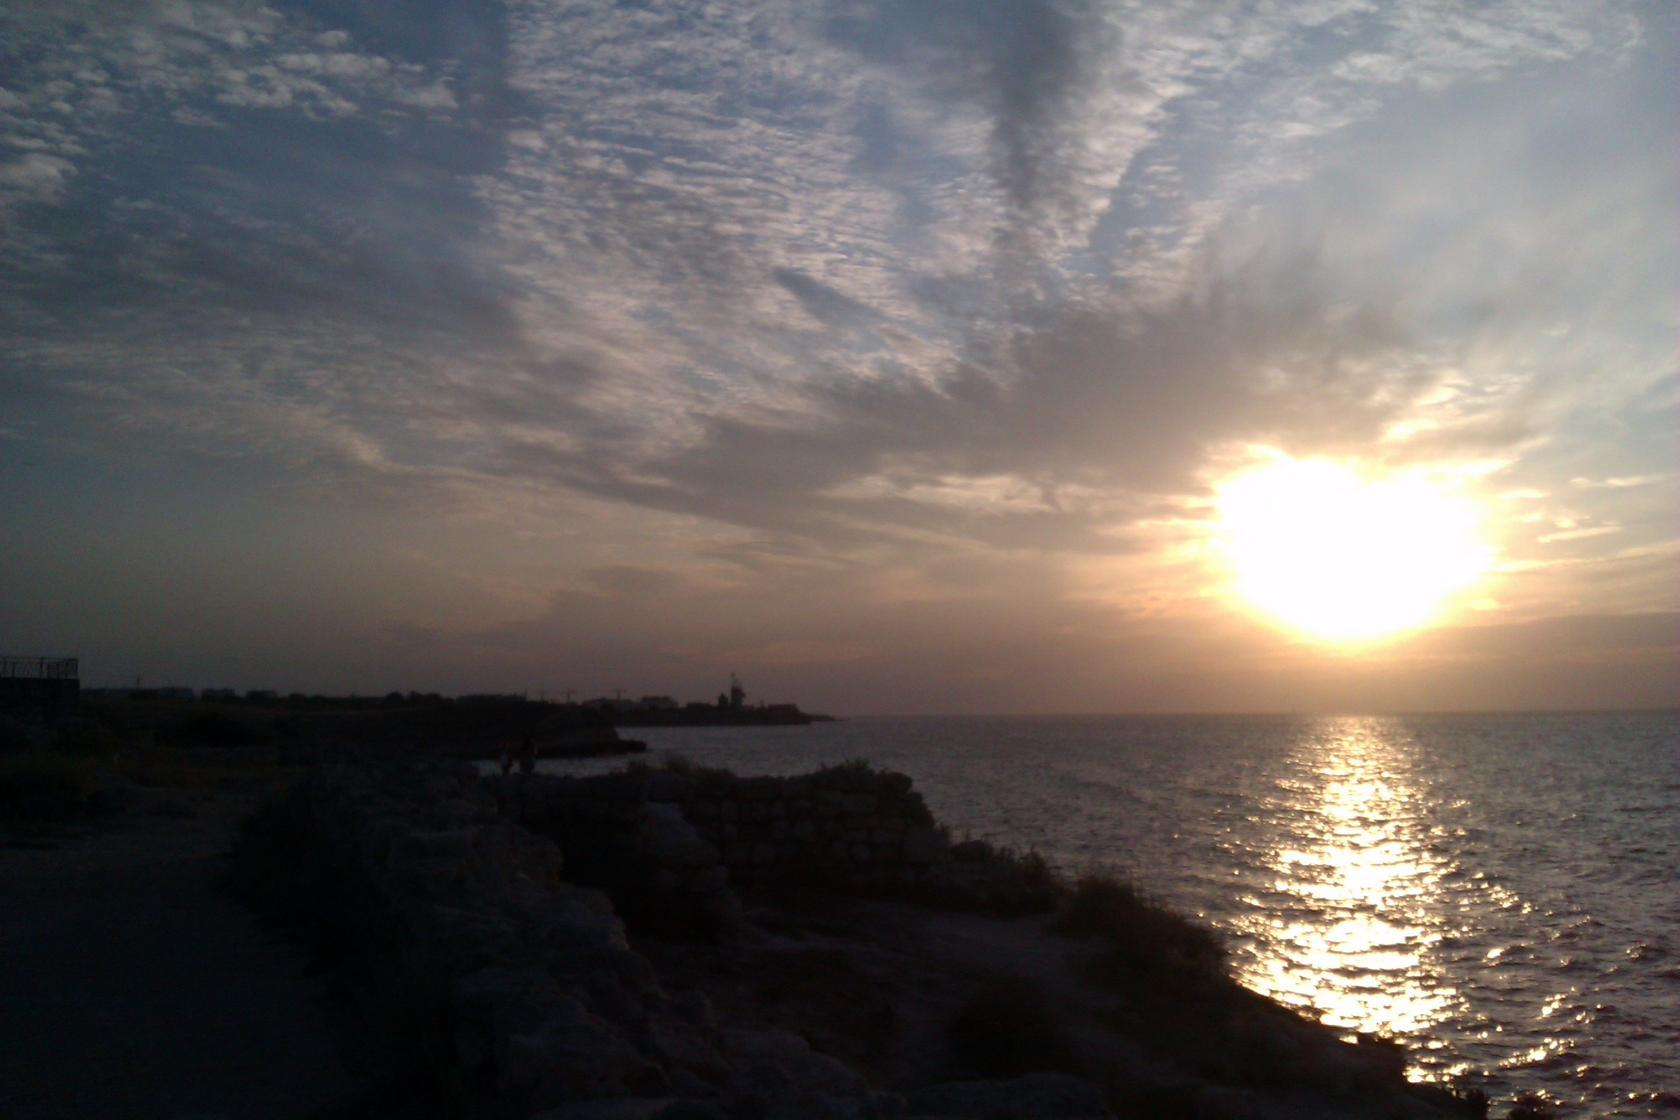 закат солнца на Херсонесе 2016г